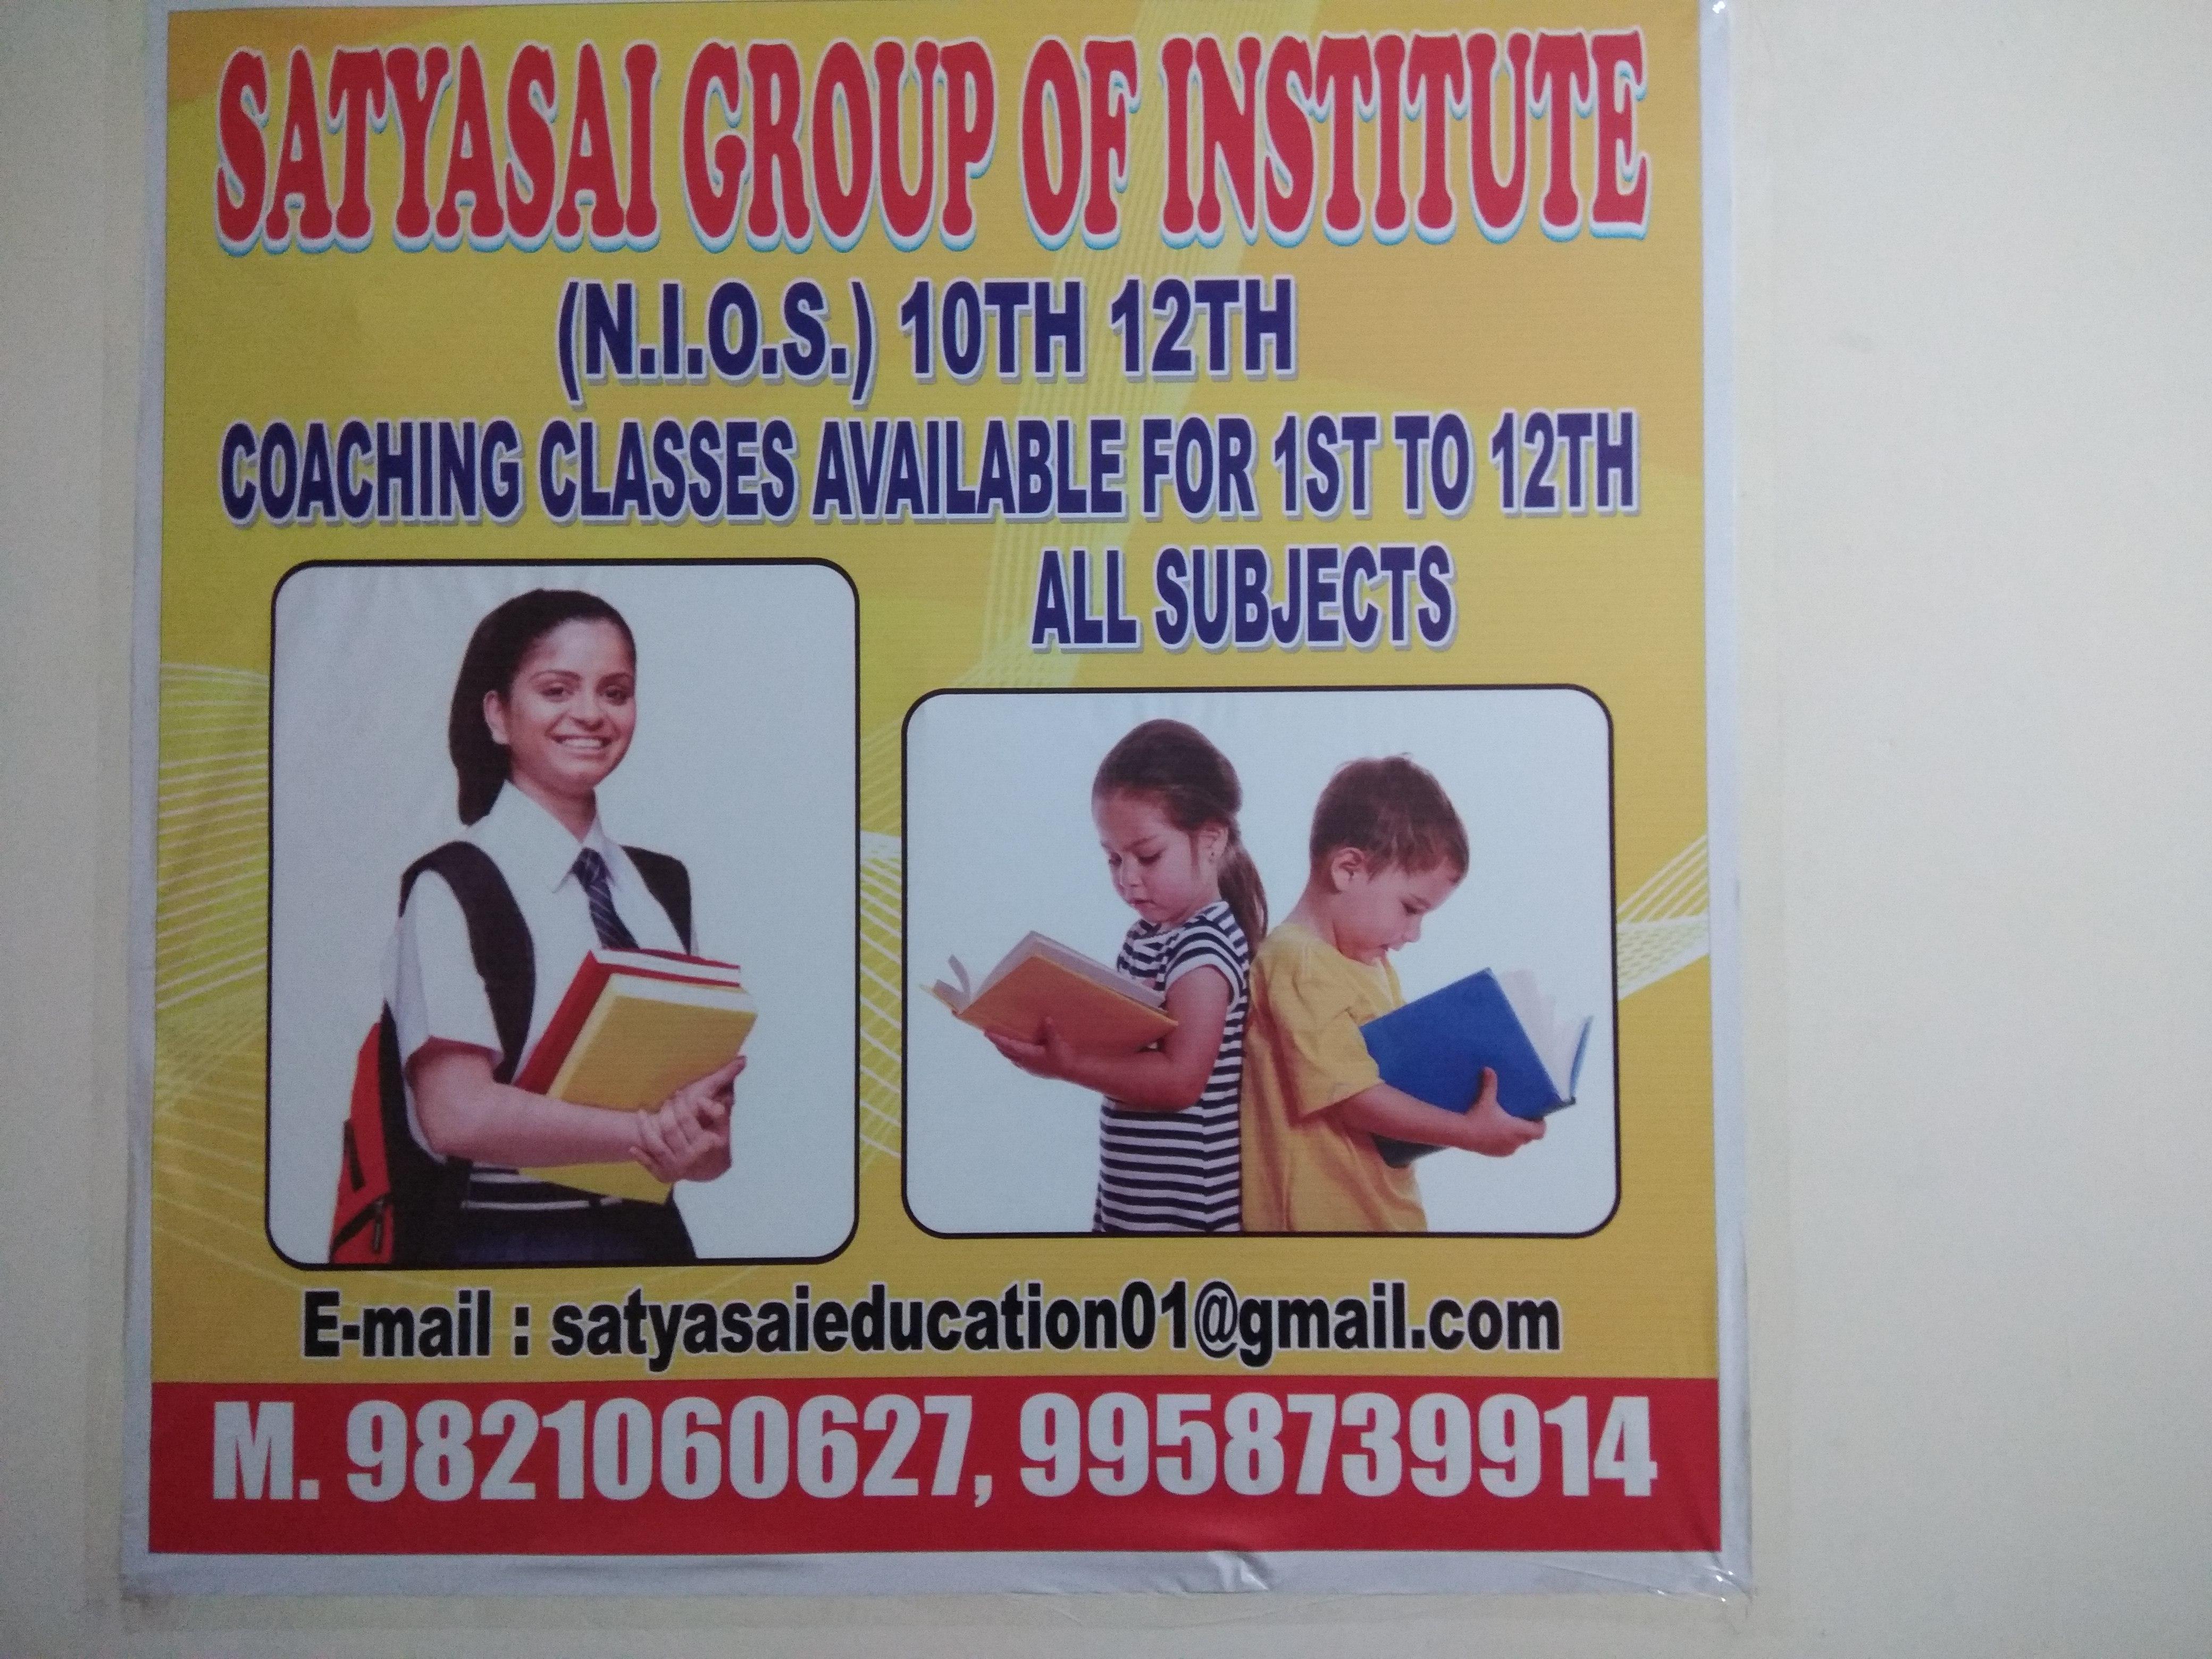 Satya Sai Group Of Institute in Uttam Nagar, Delhi-110059